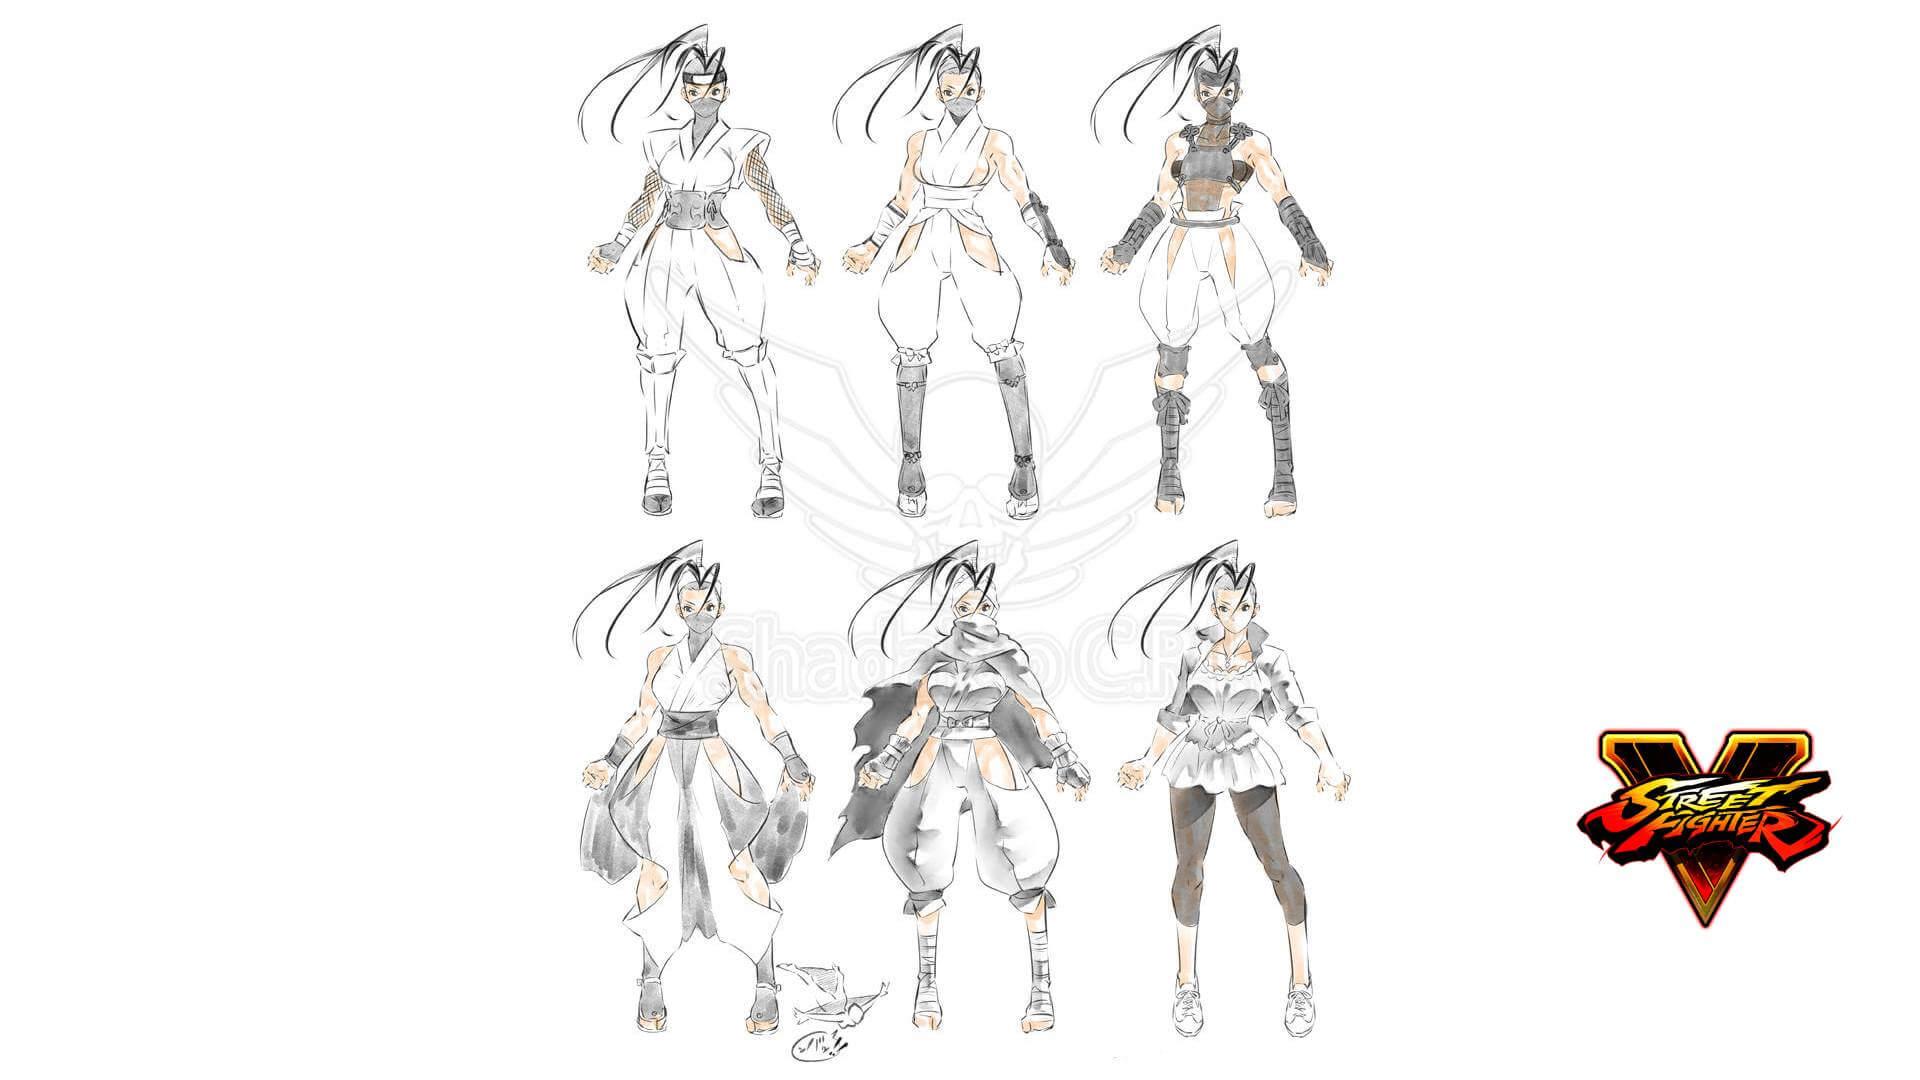 Capcom Inspires - Concept Arts of Ibuki's Costume